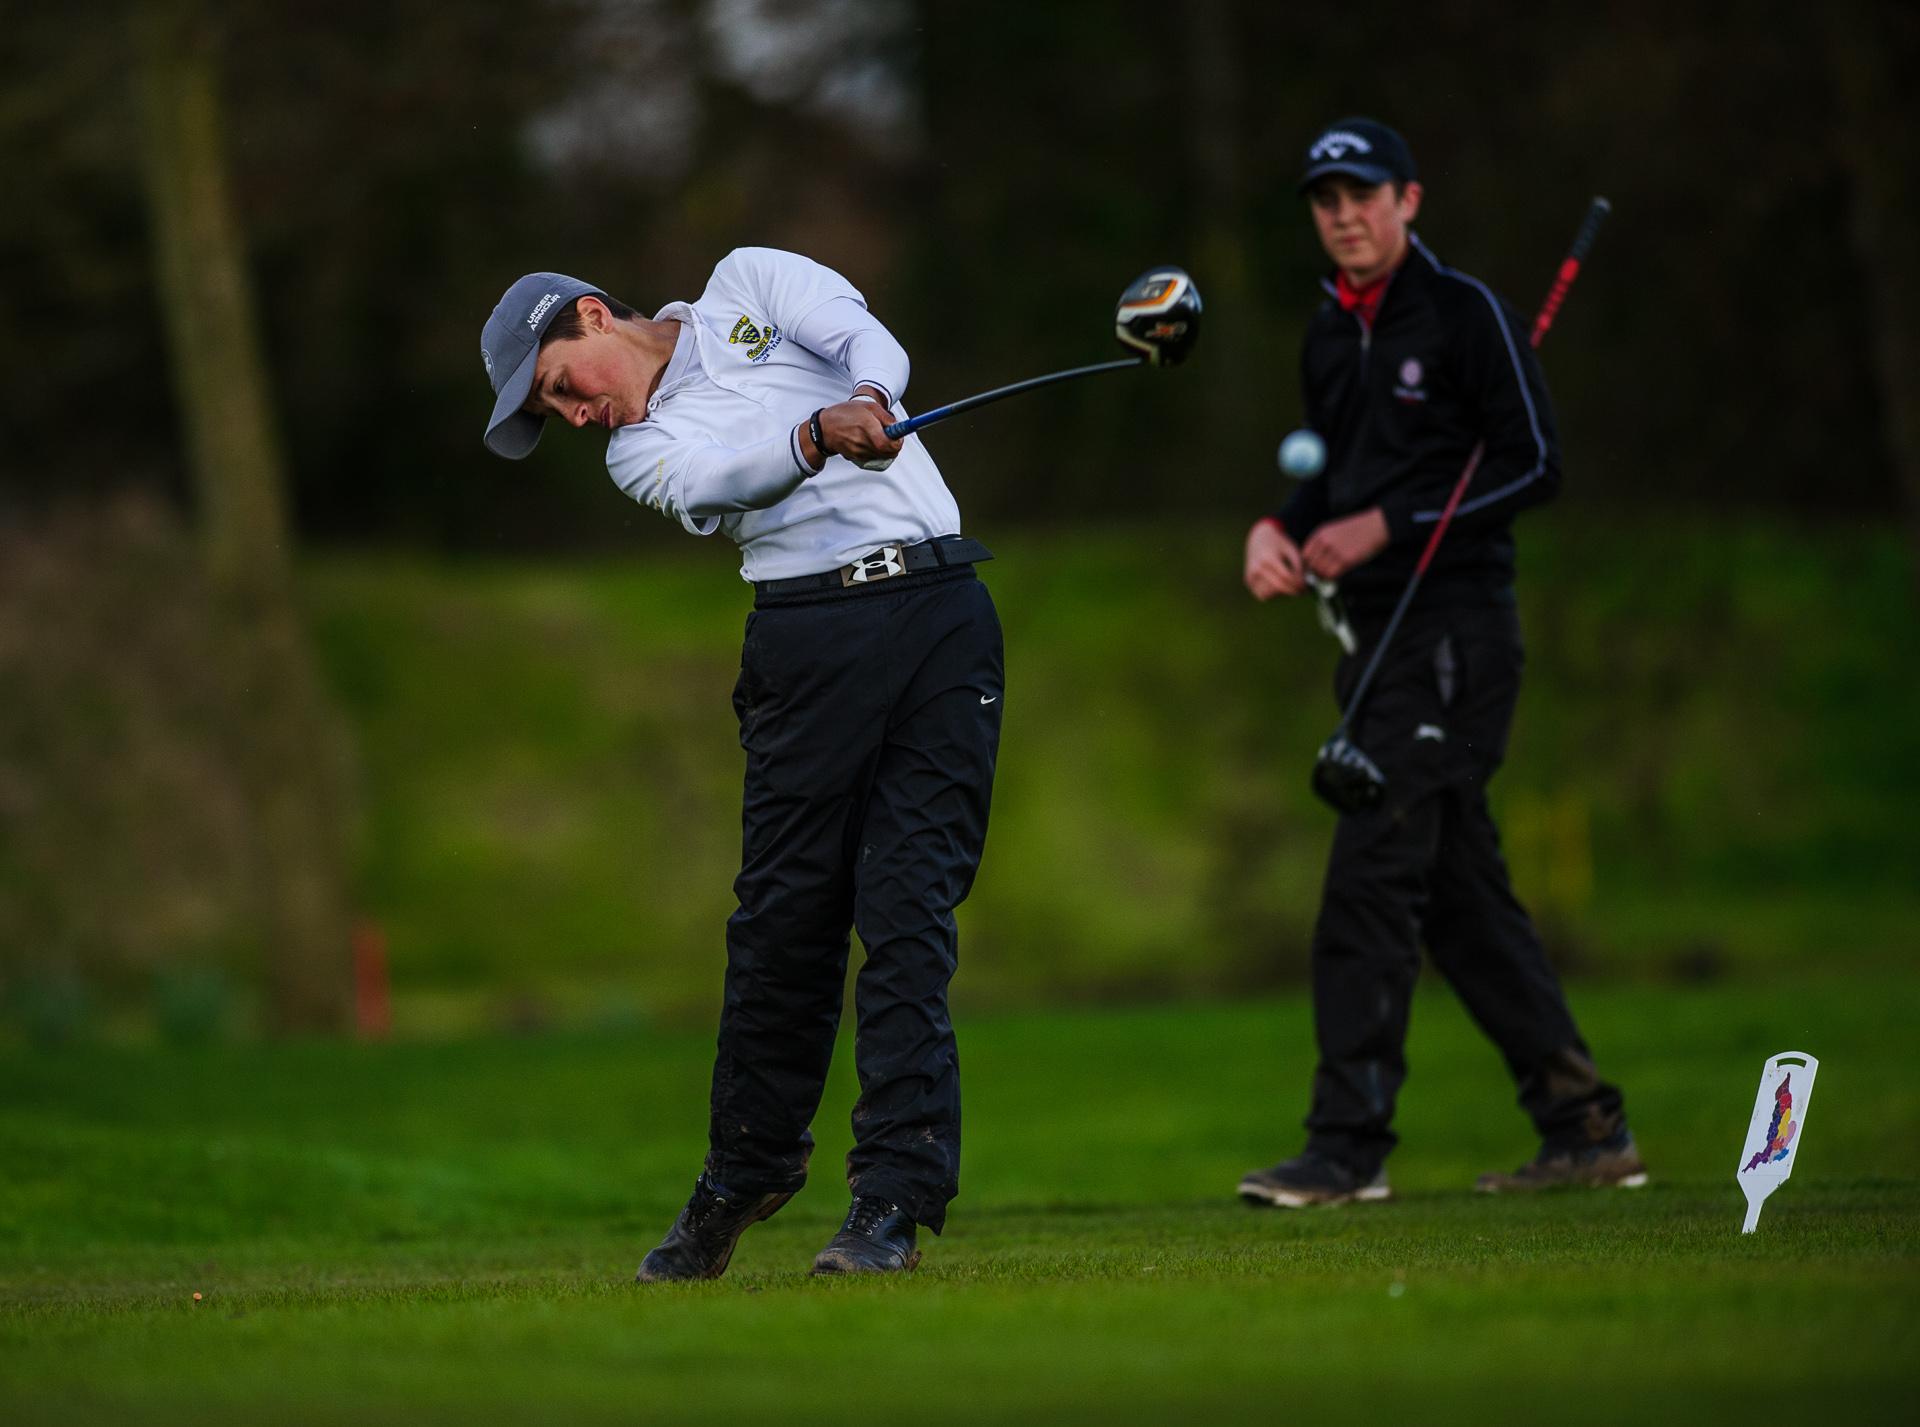 Kevindiss.com golf course photography Hawkstone Park golf course-1124.jpg